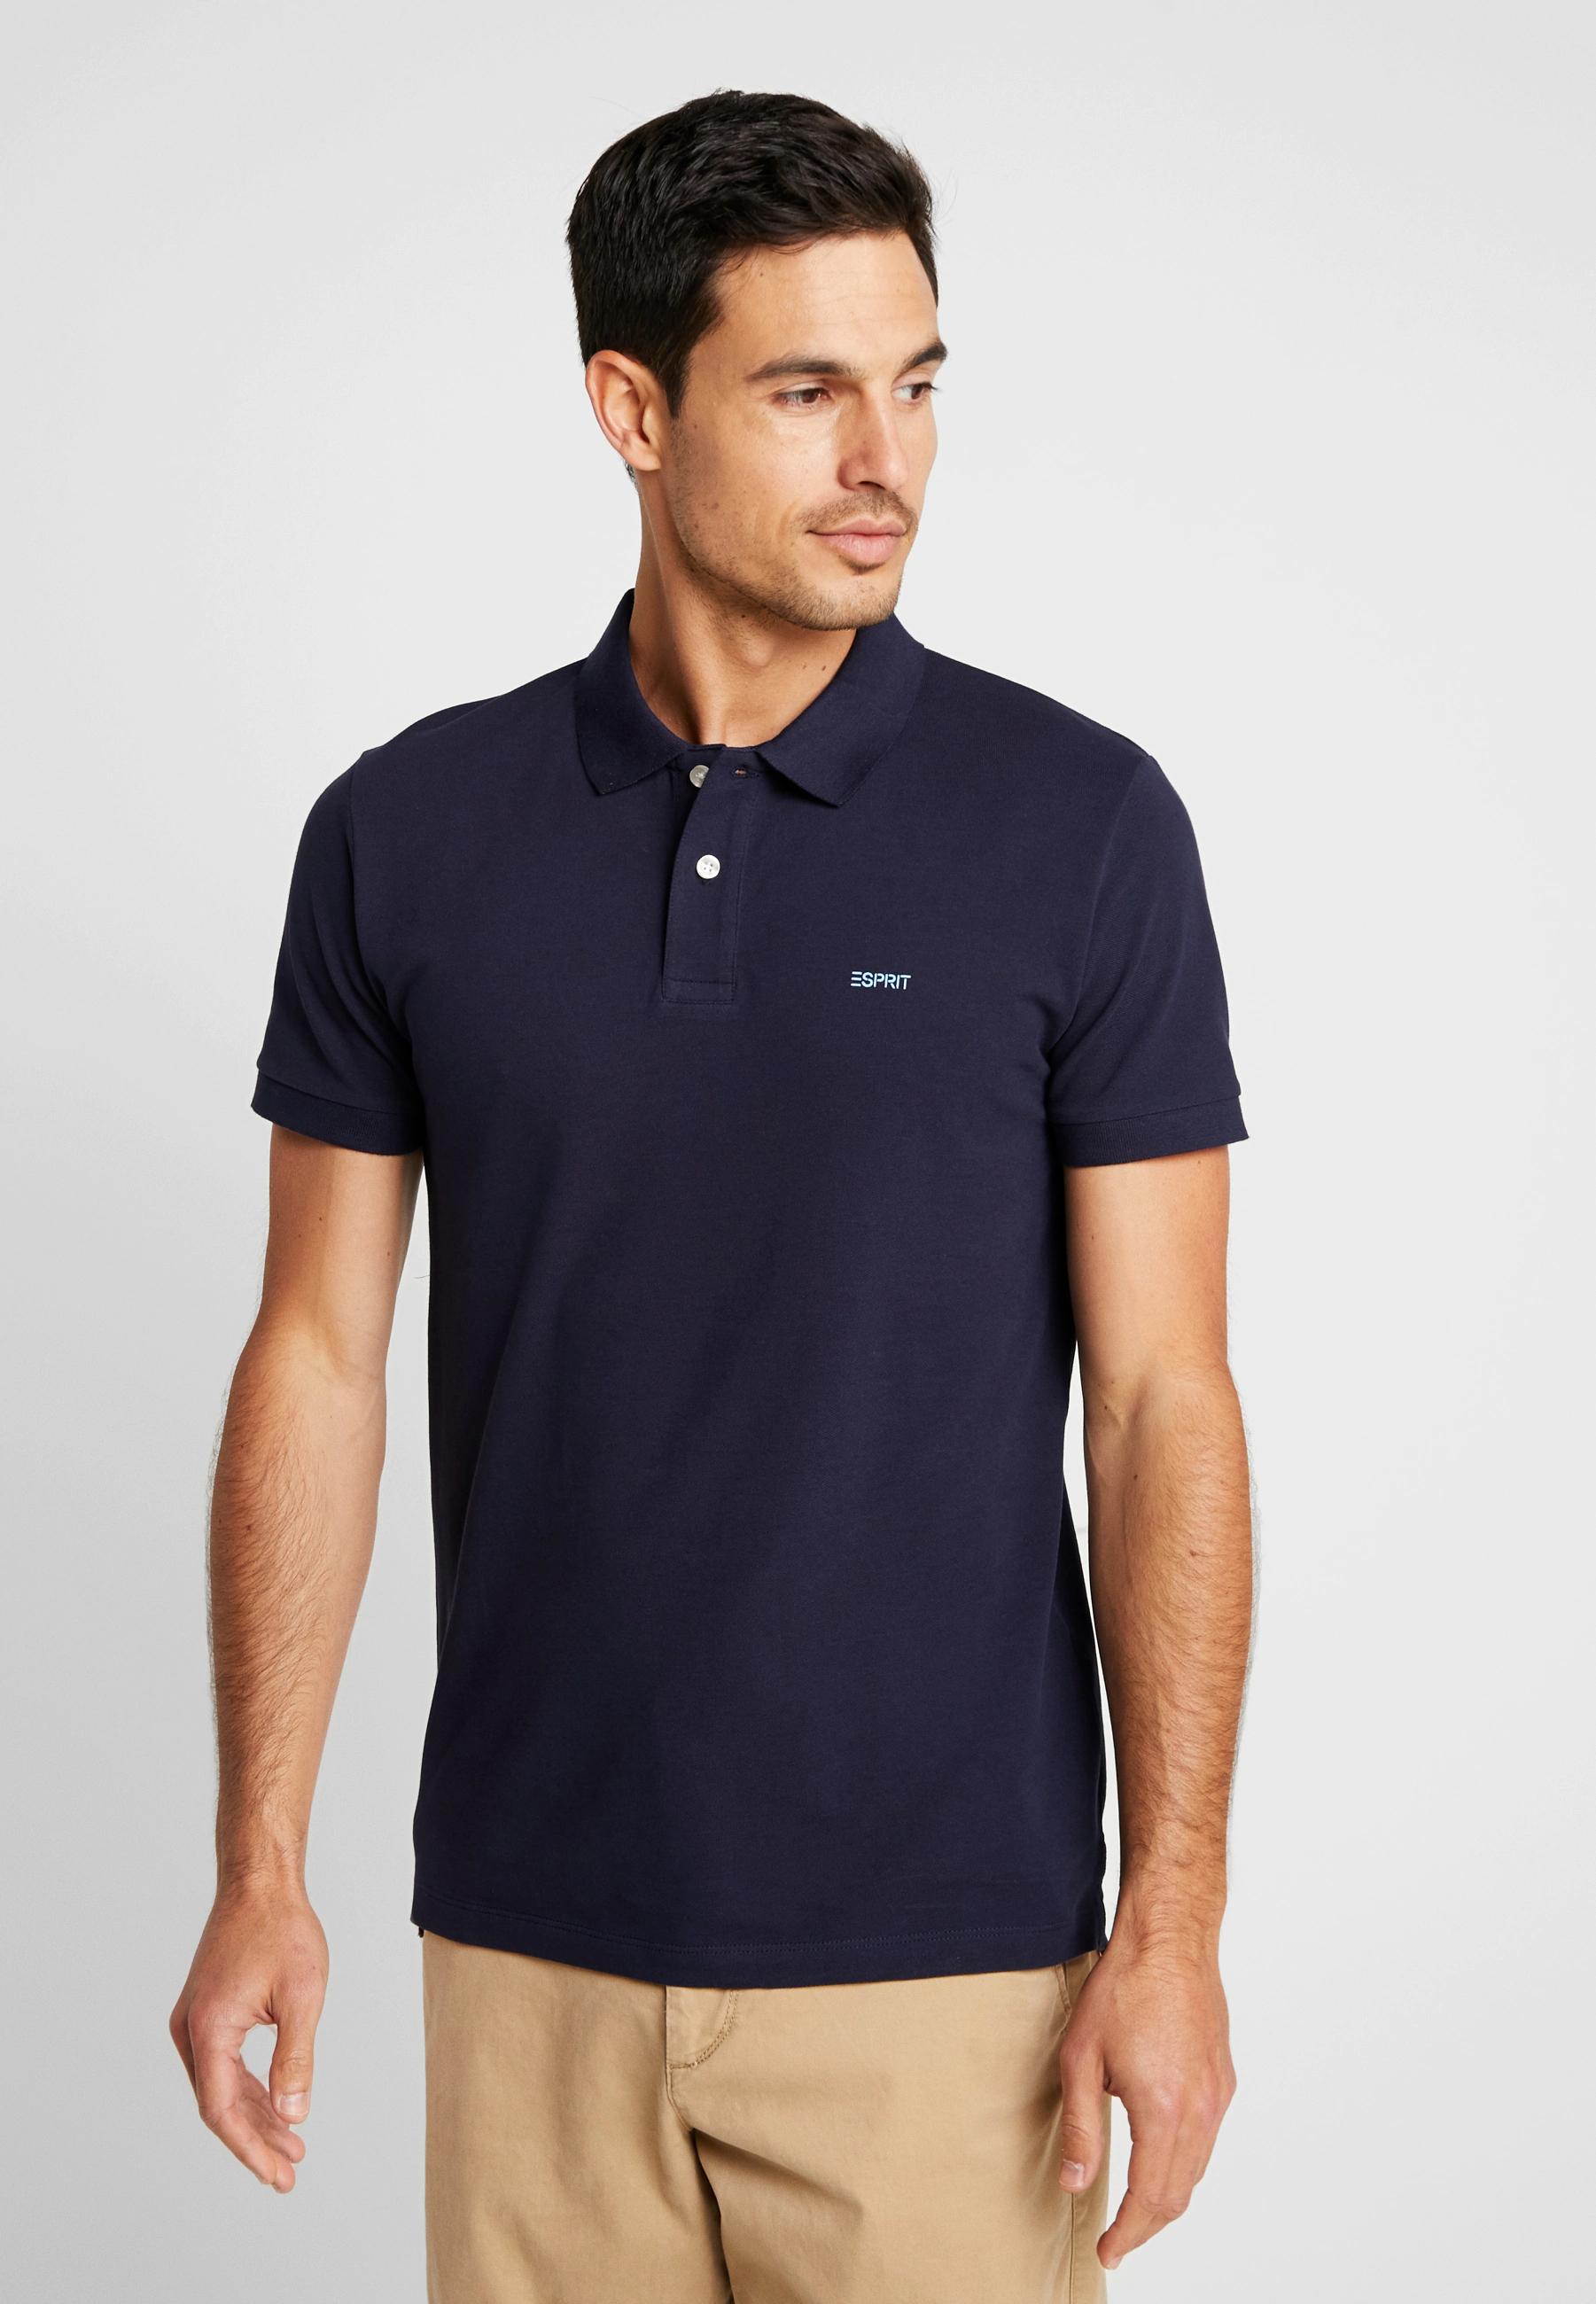 ESPRIT Polo Shirt £6.75 +£3 delivery @ Zalando